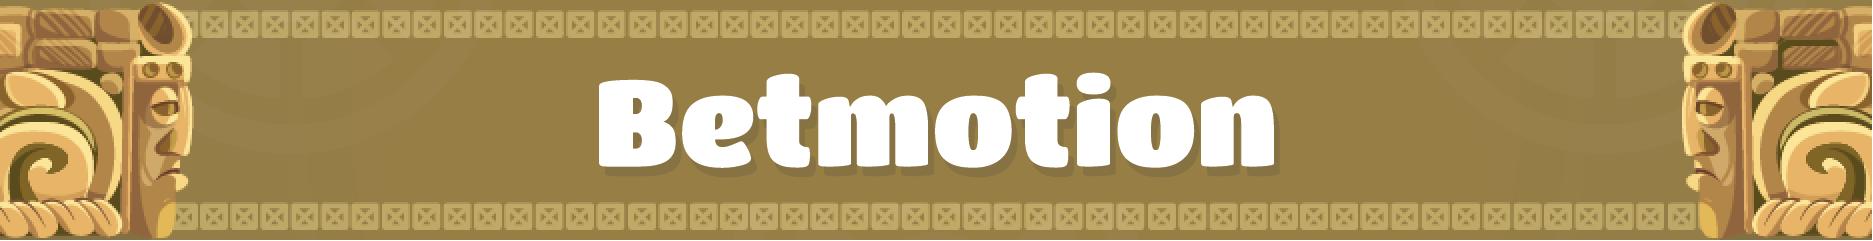 Betmotion Reseña